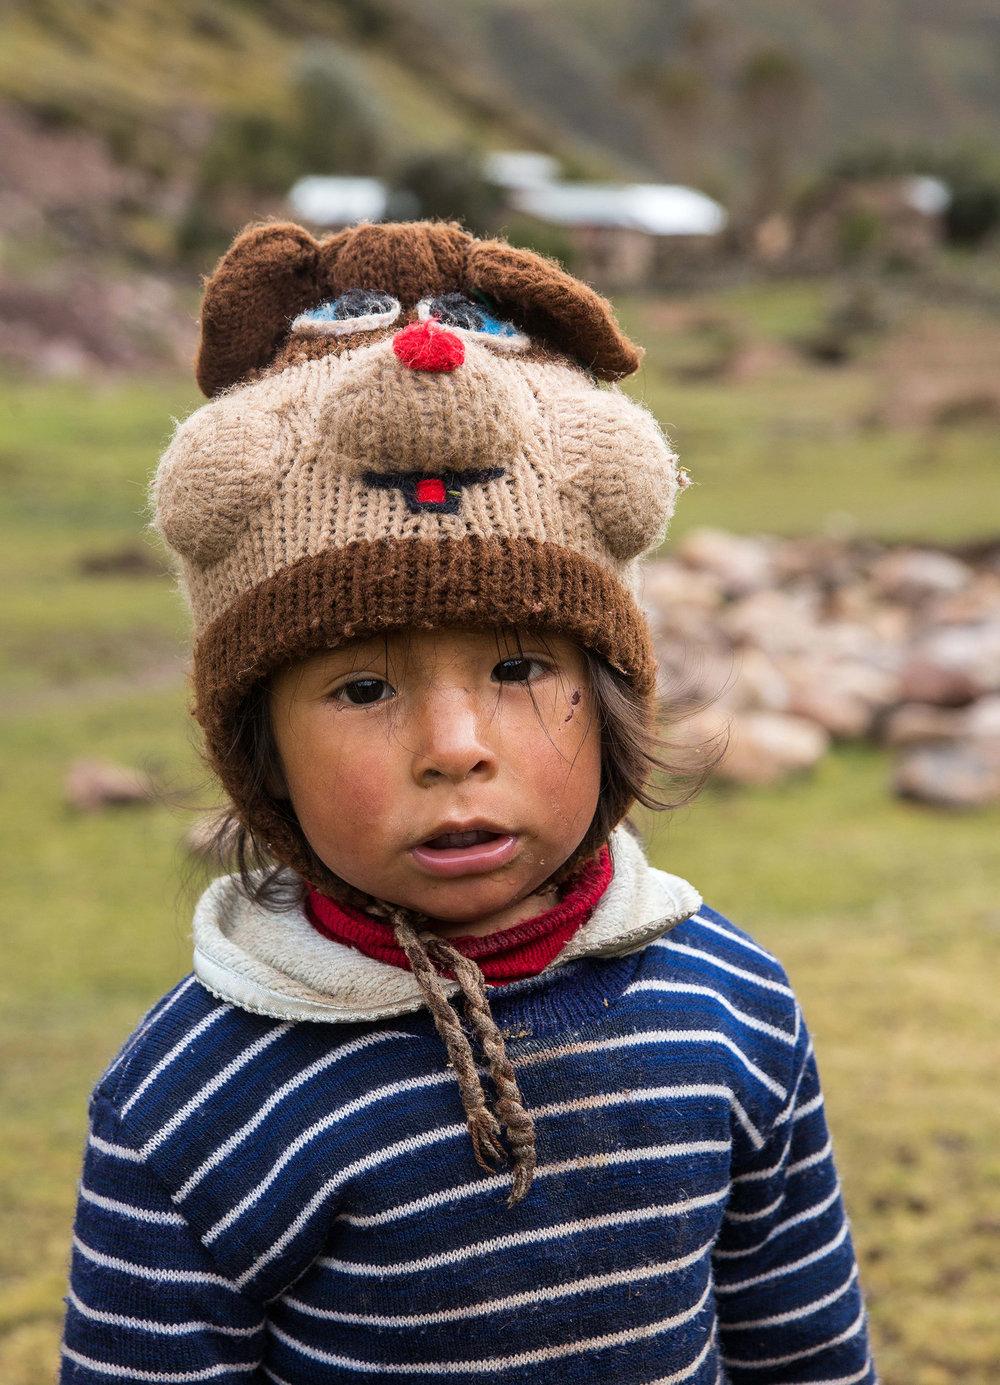 Huachuasi-Peru-3027.jpg